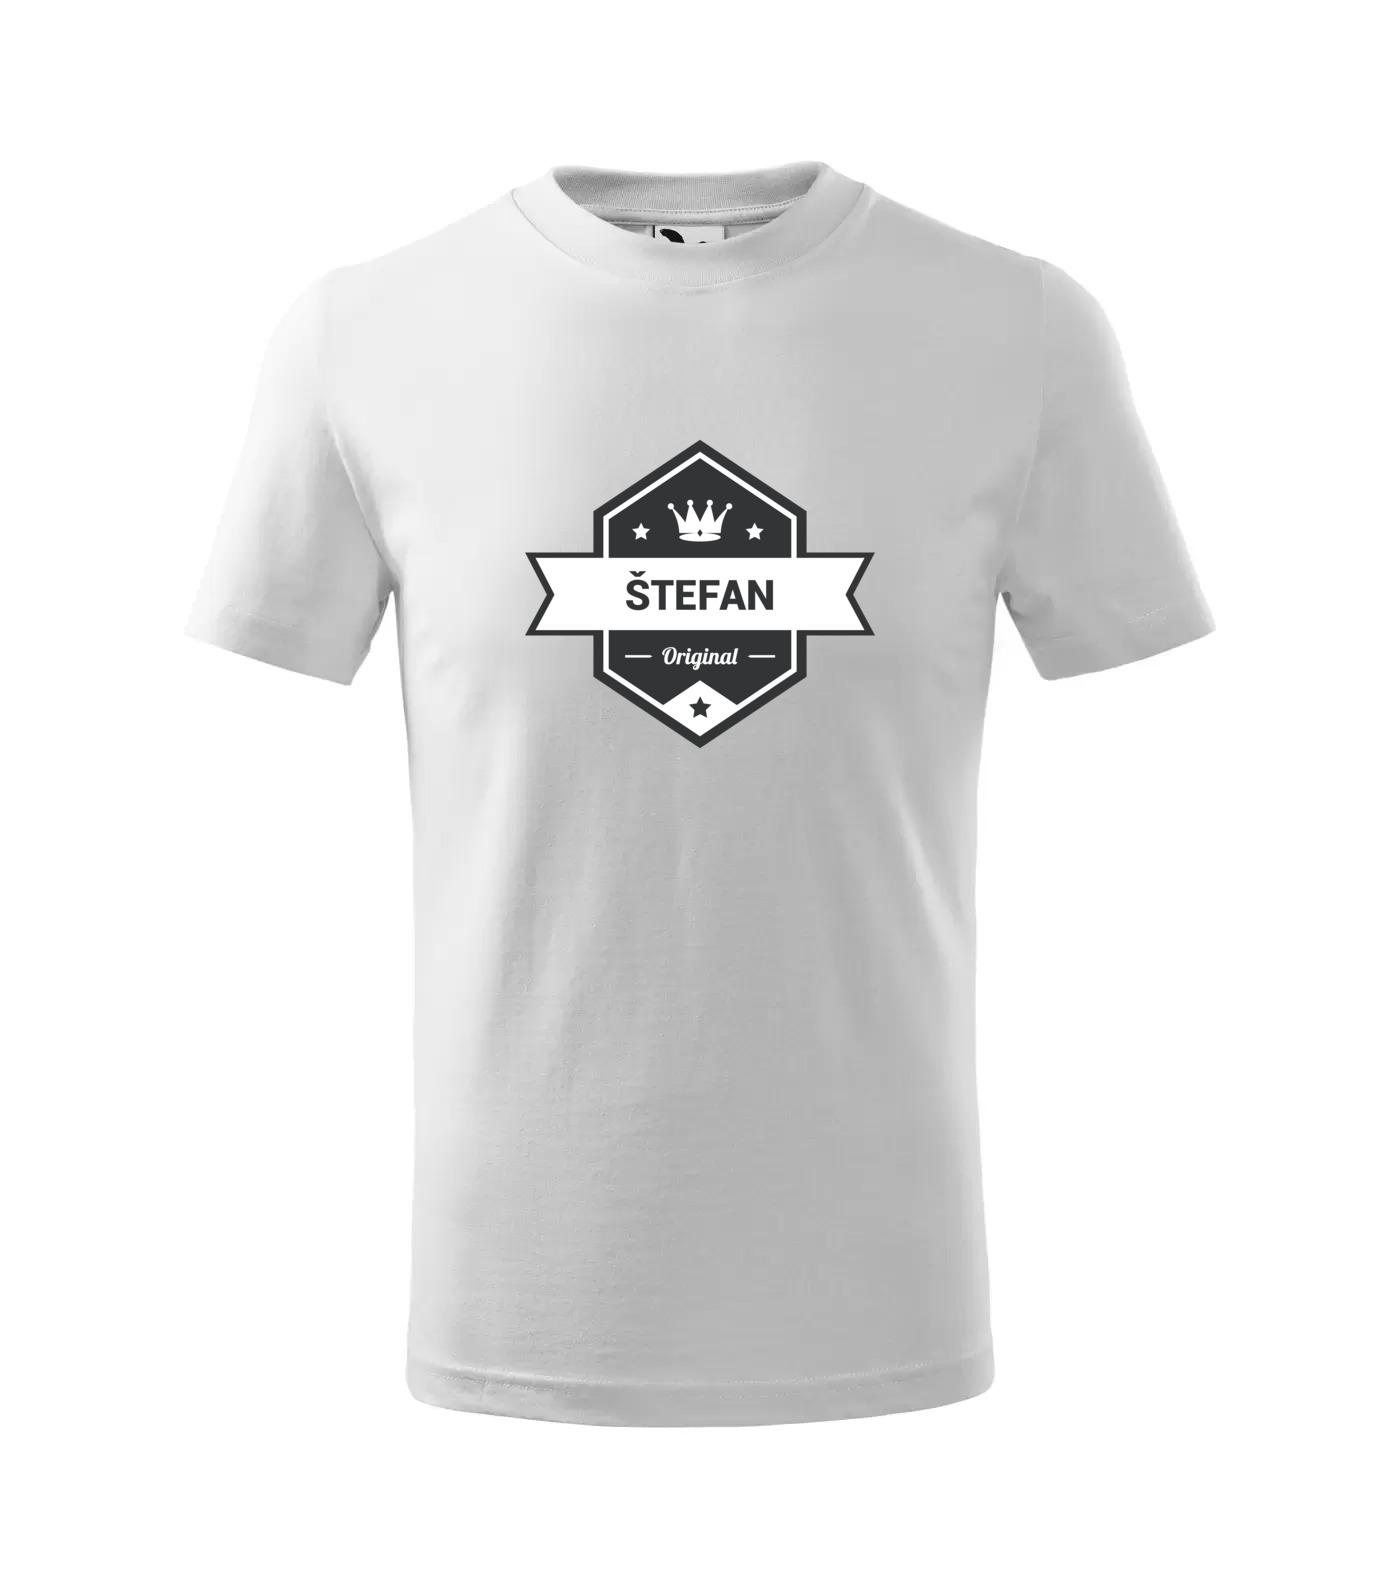 Tričko King Štefan